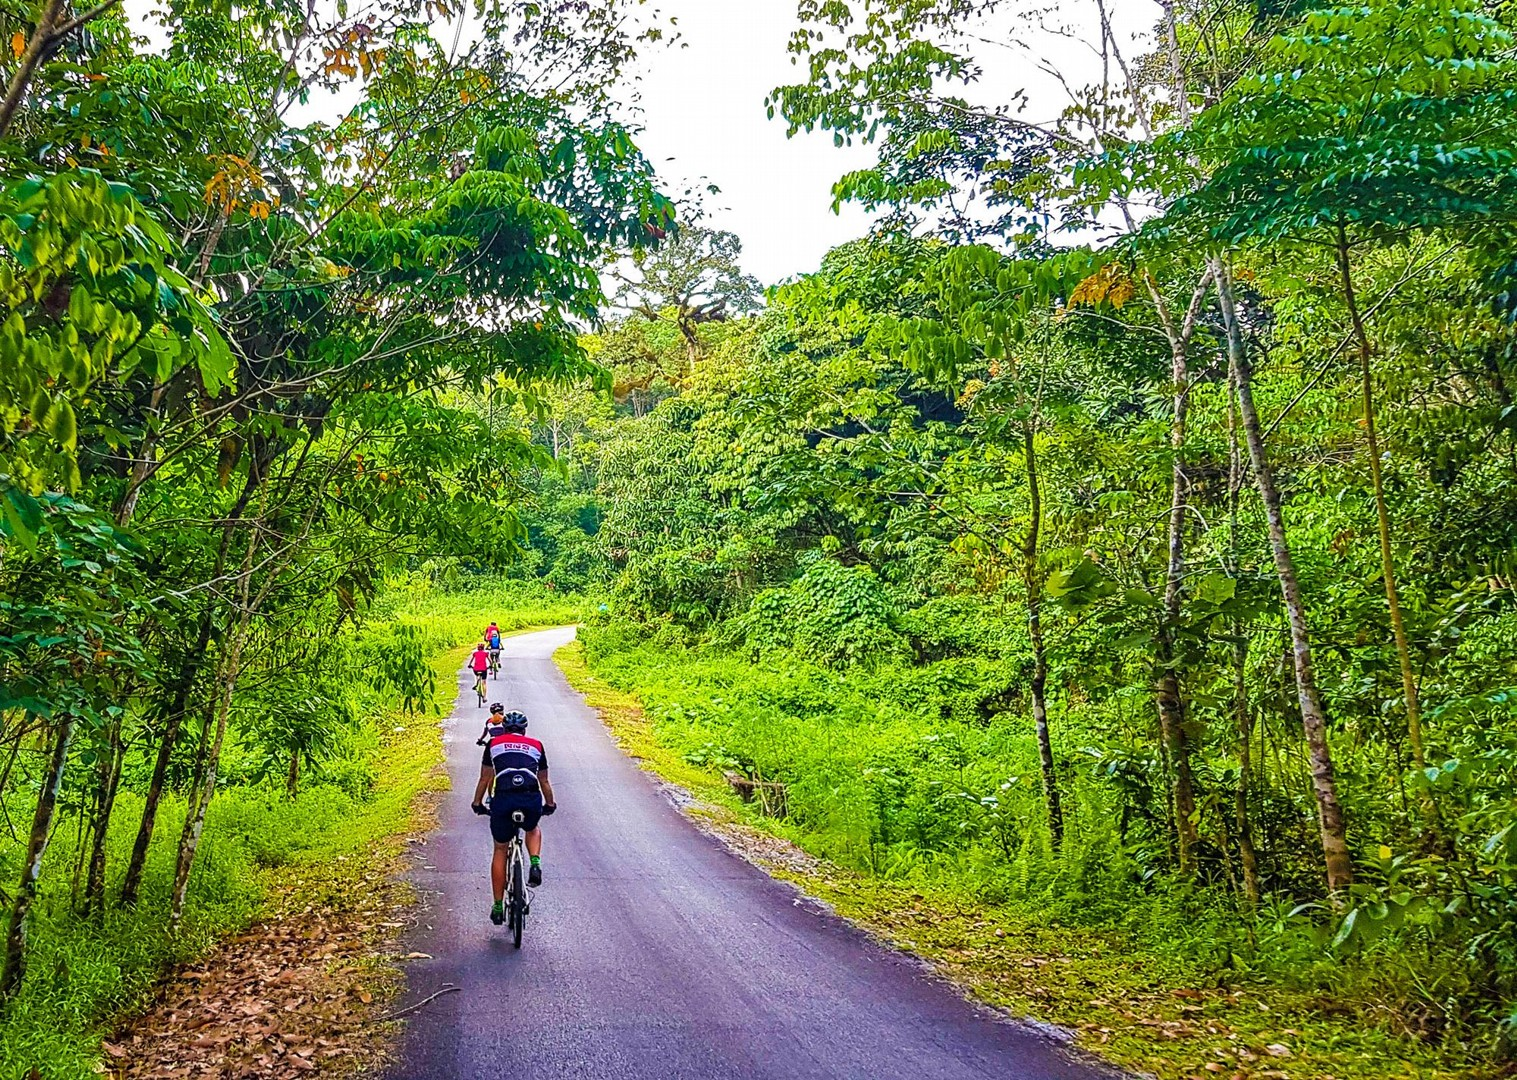 20190420_163324.jpg - Borneo - Secret Sarawak - Cycling Adventures